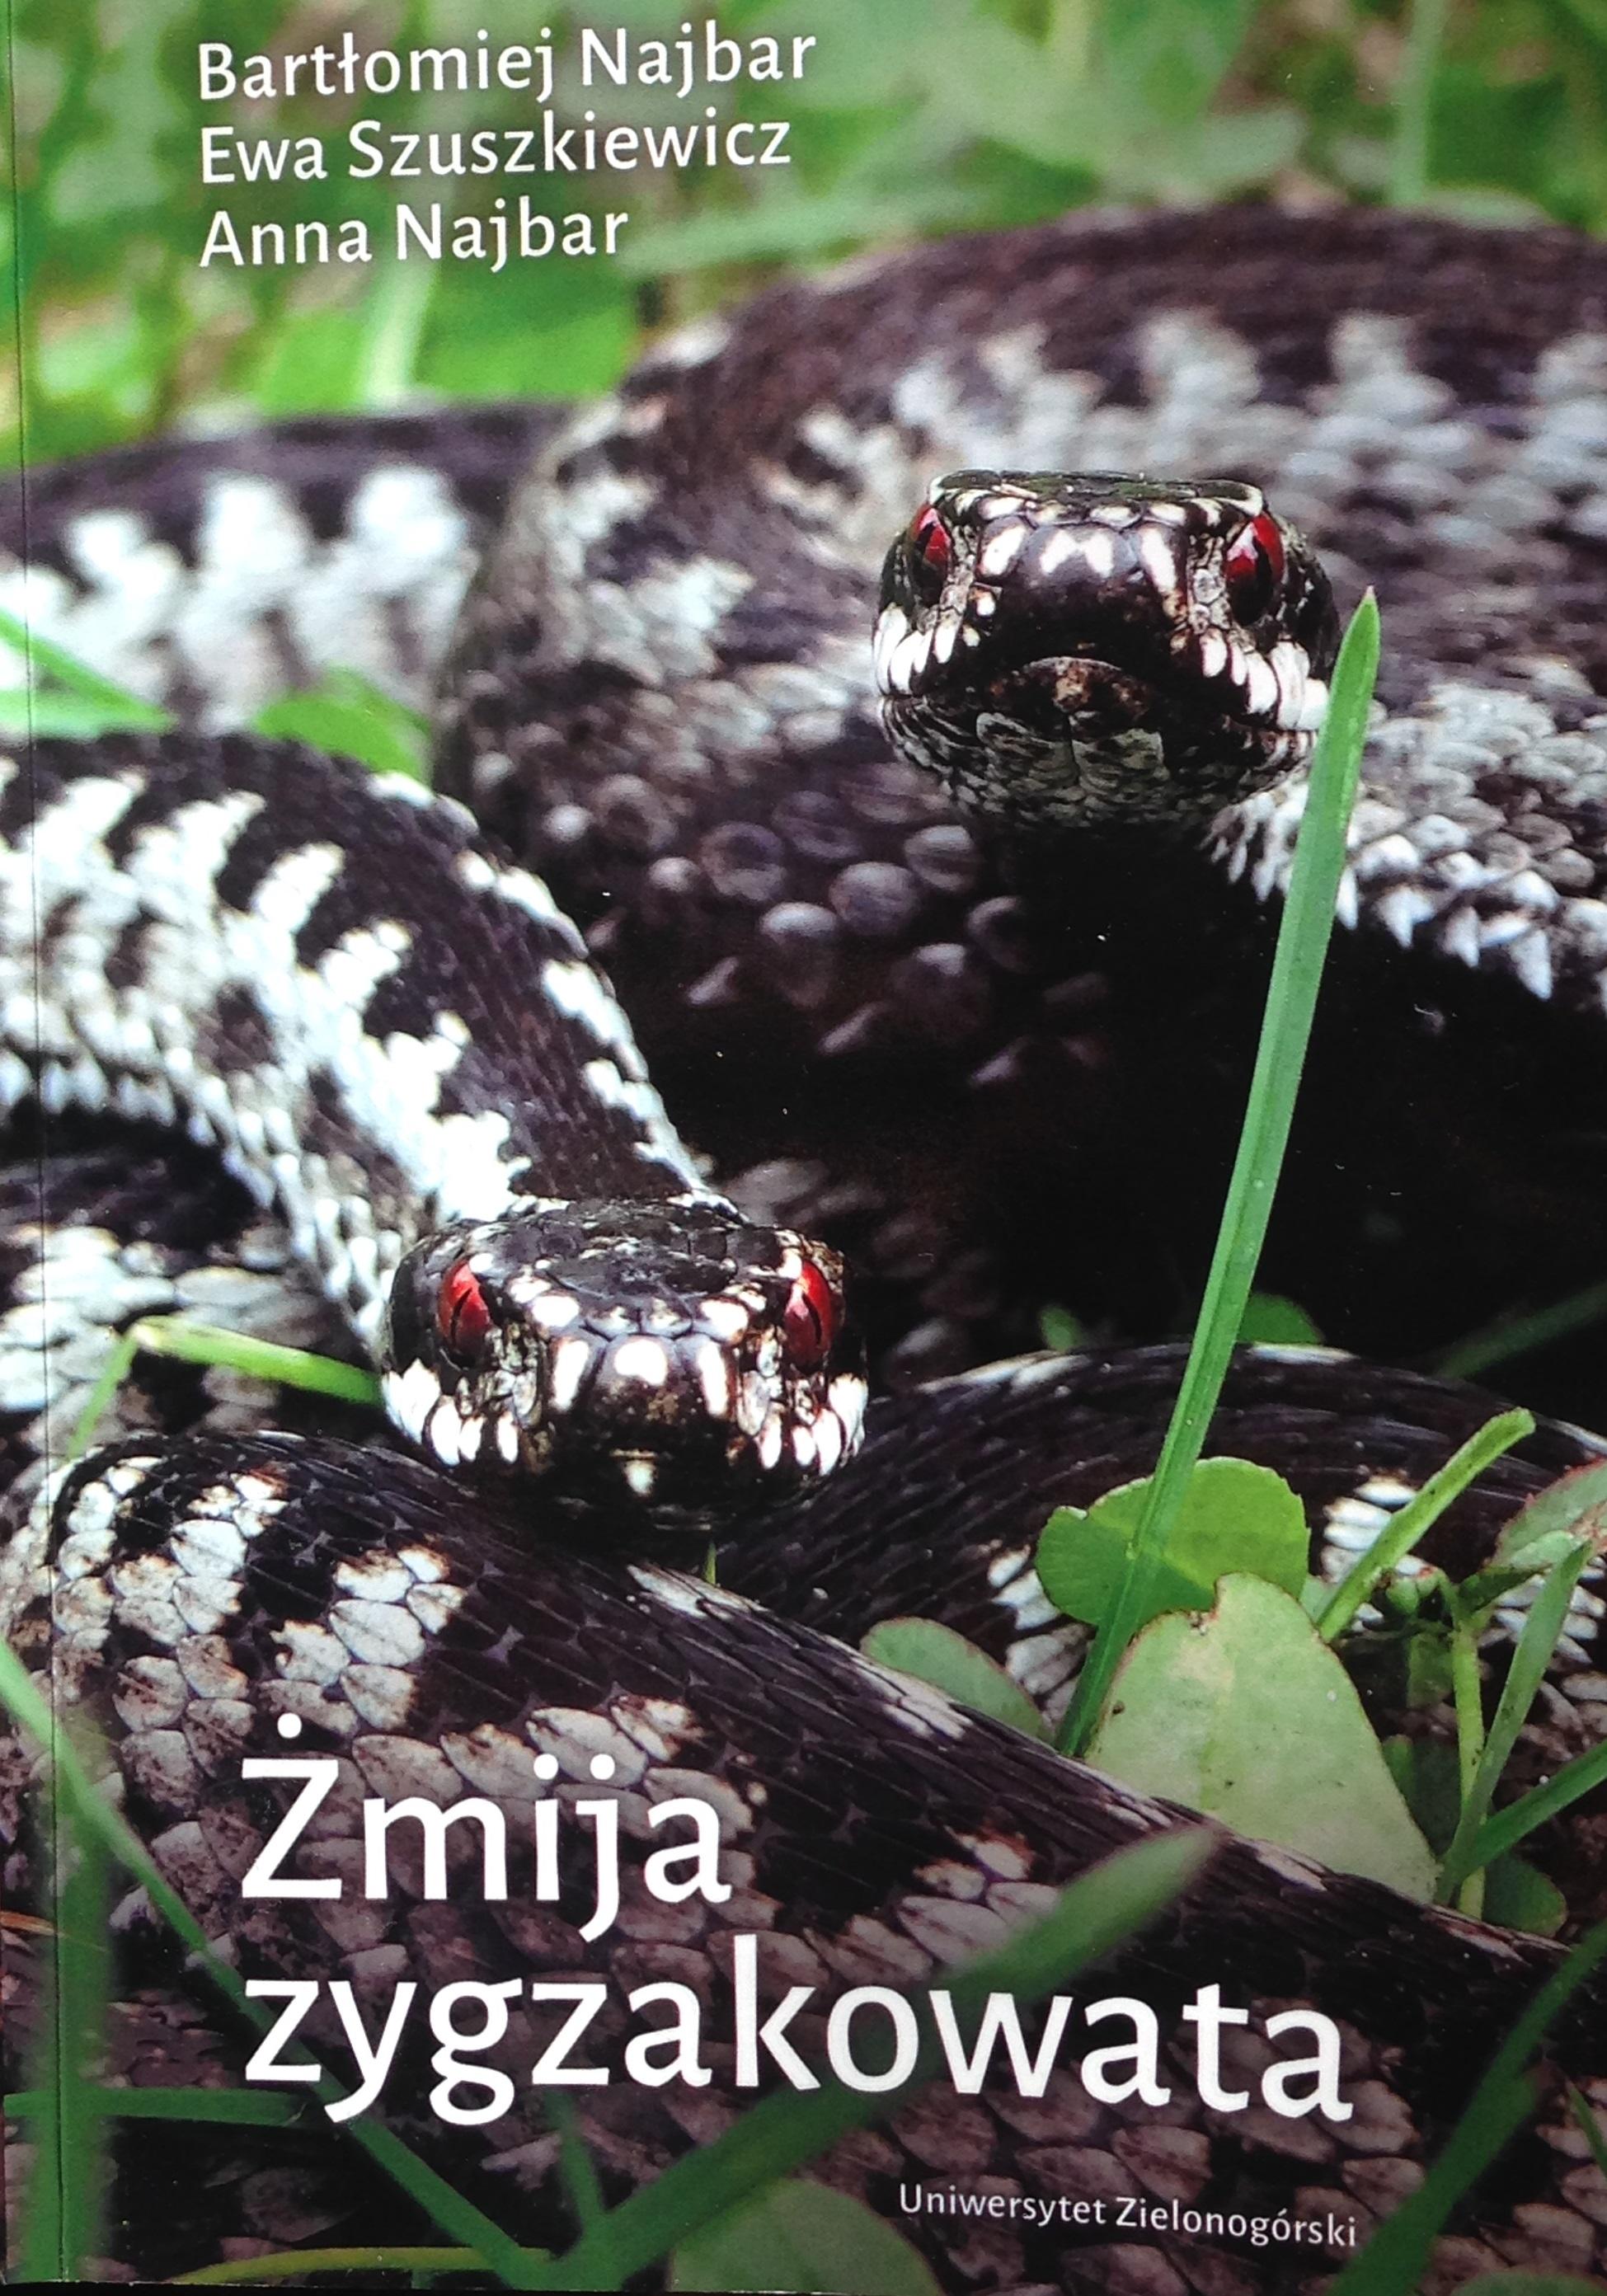 Daniel Jablonski Herpetology Traveling Dilznoofus39s Tessellation Book Venezuela Asian Pitvipers Zmija